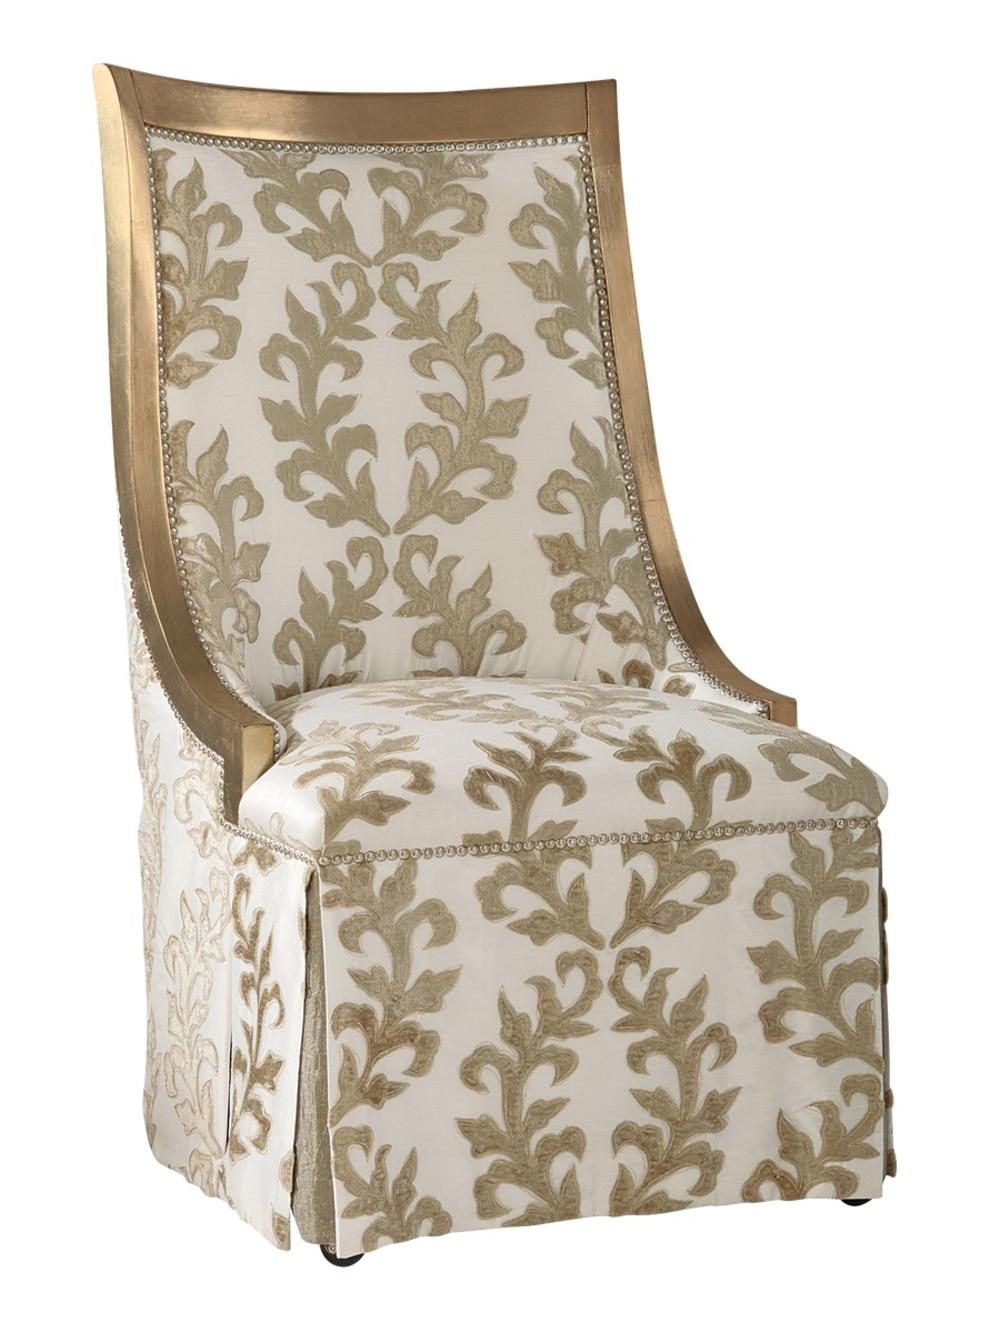 Marge Carson - Jolie Side Chair